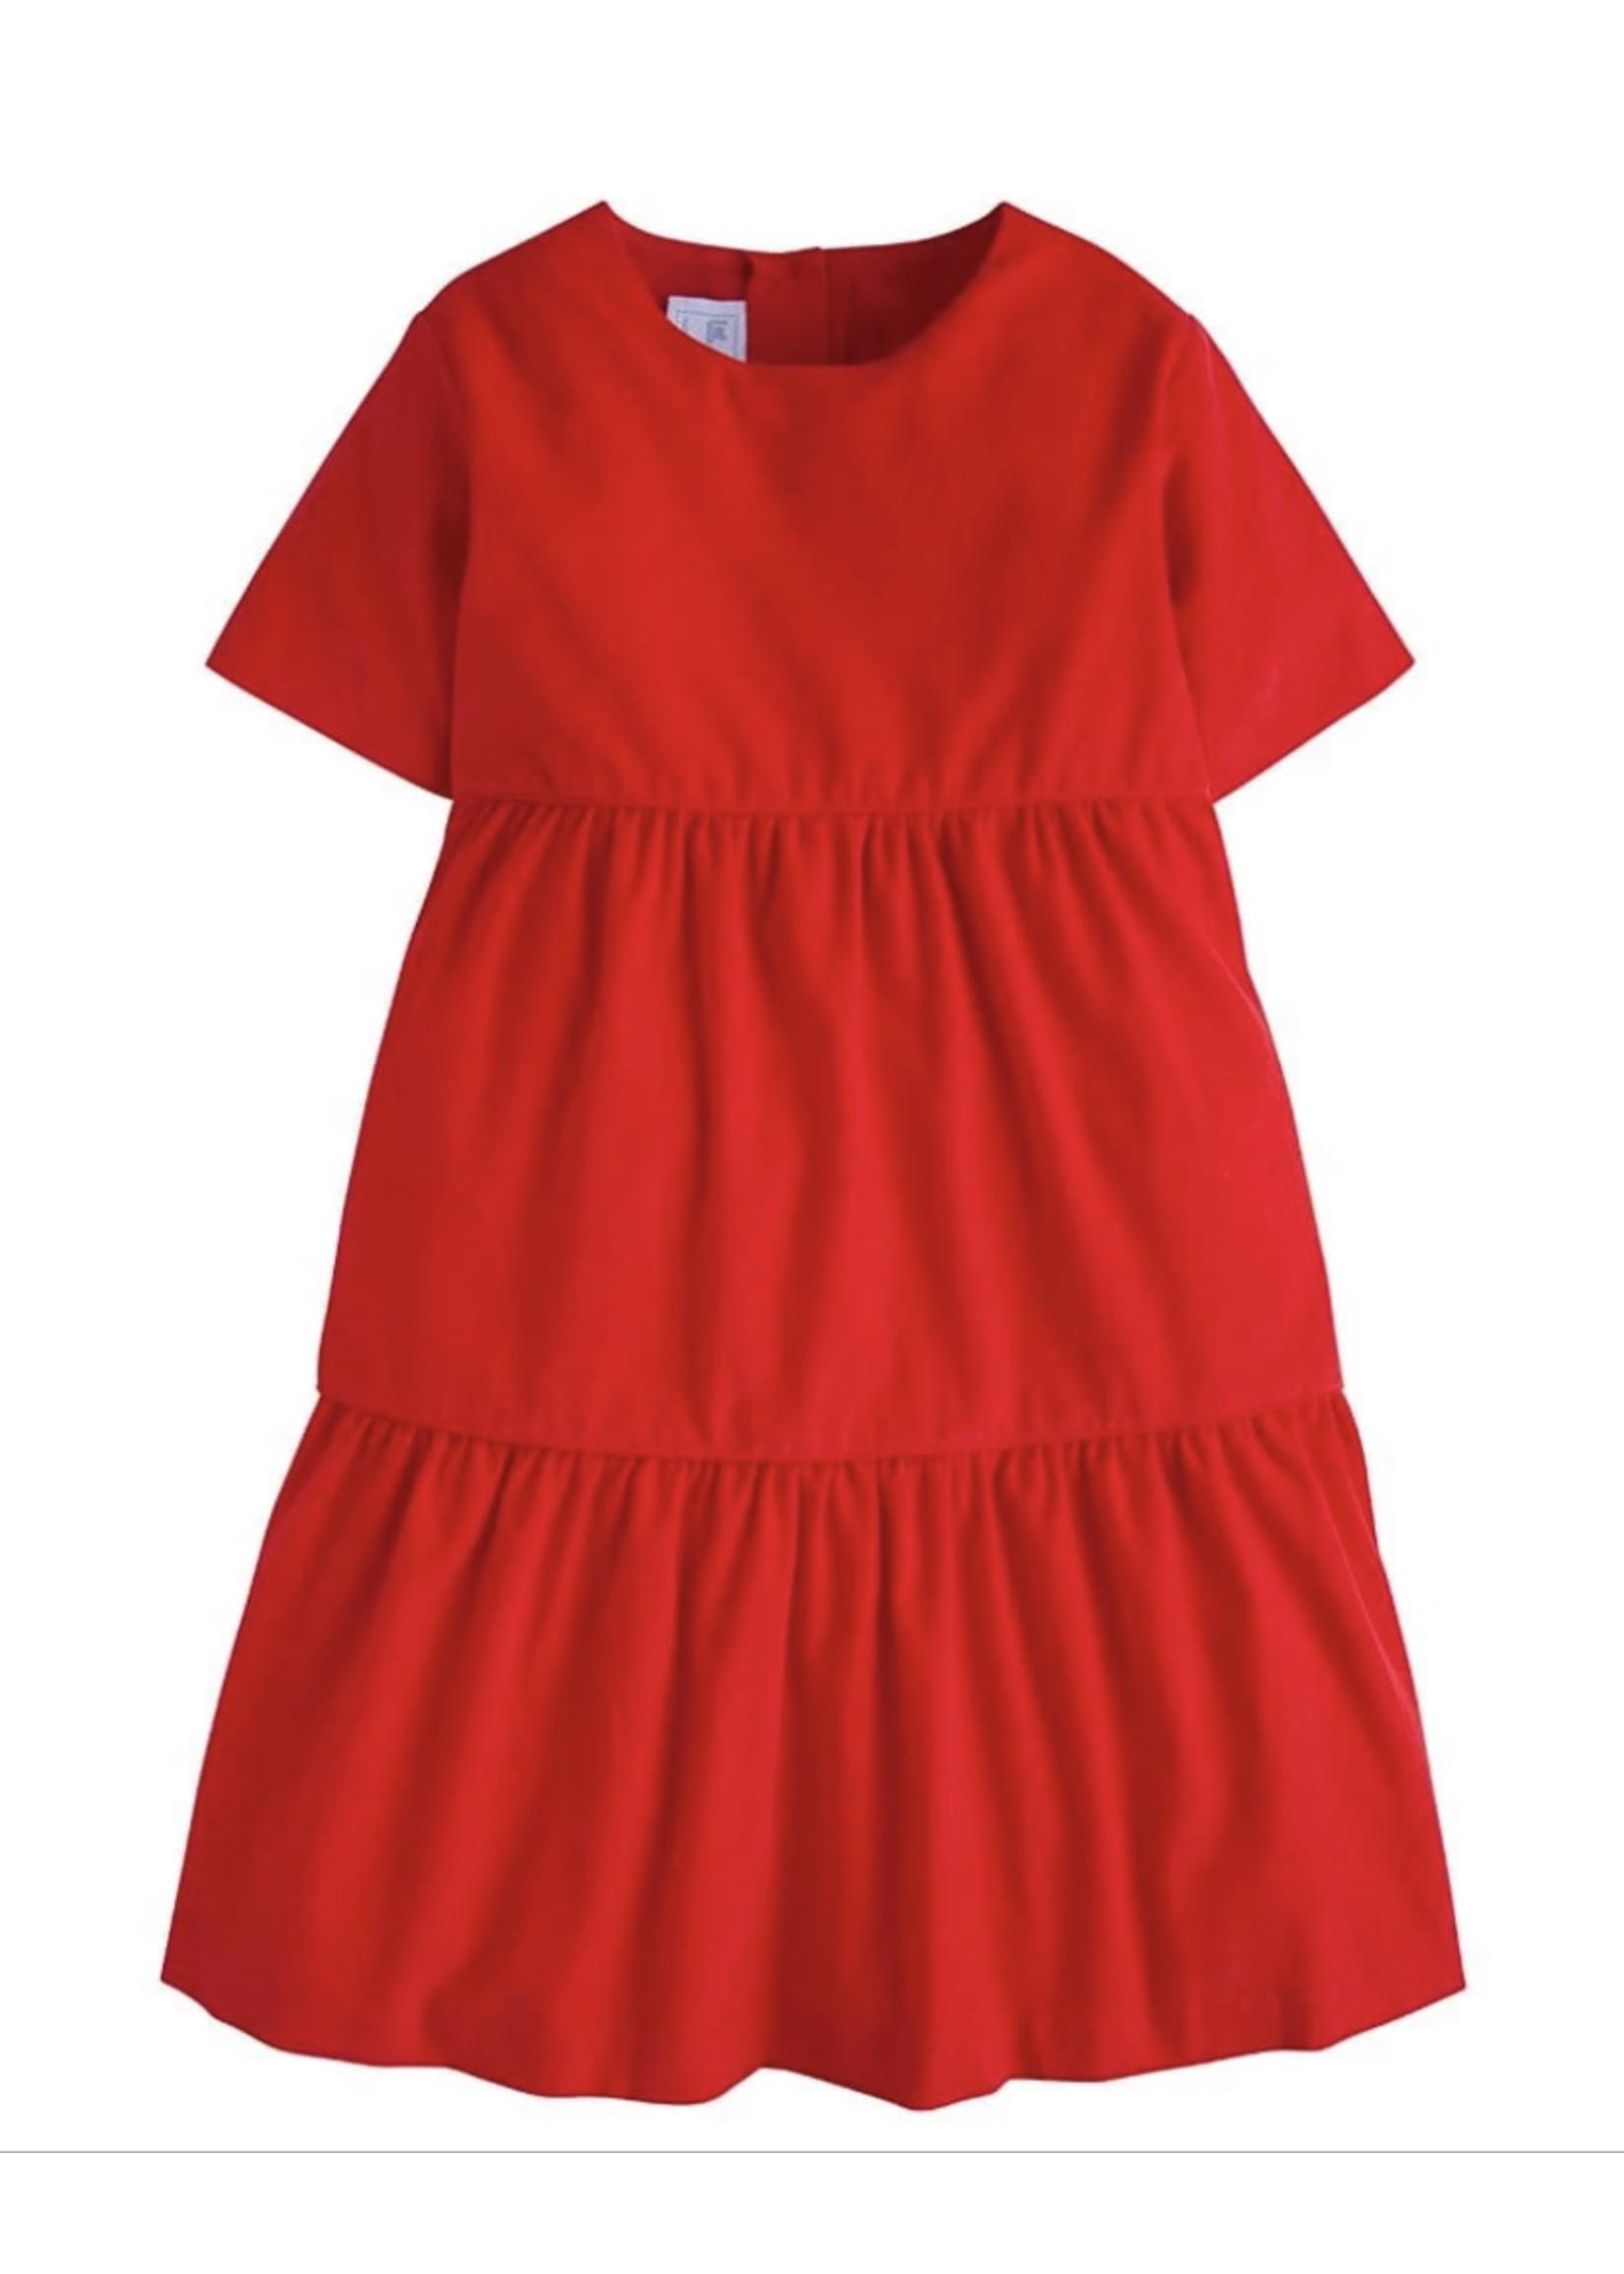 Little English Jillian Red Corduroy Dress